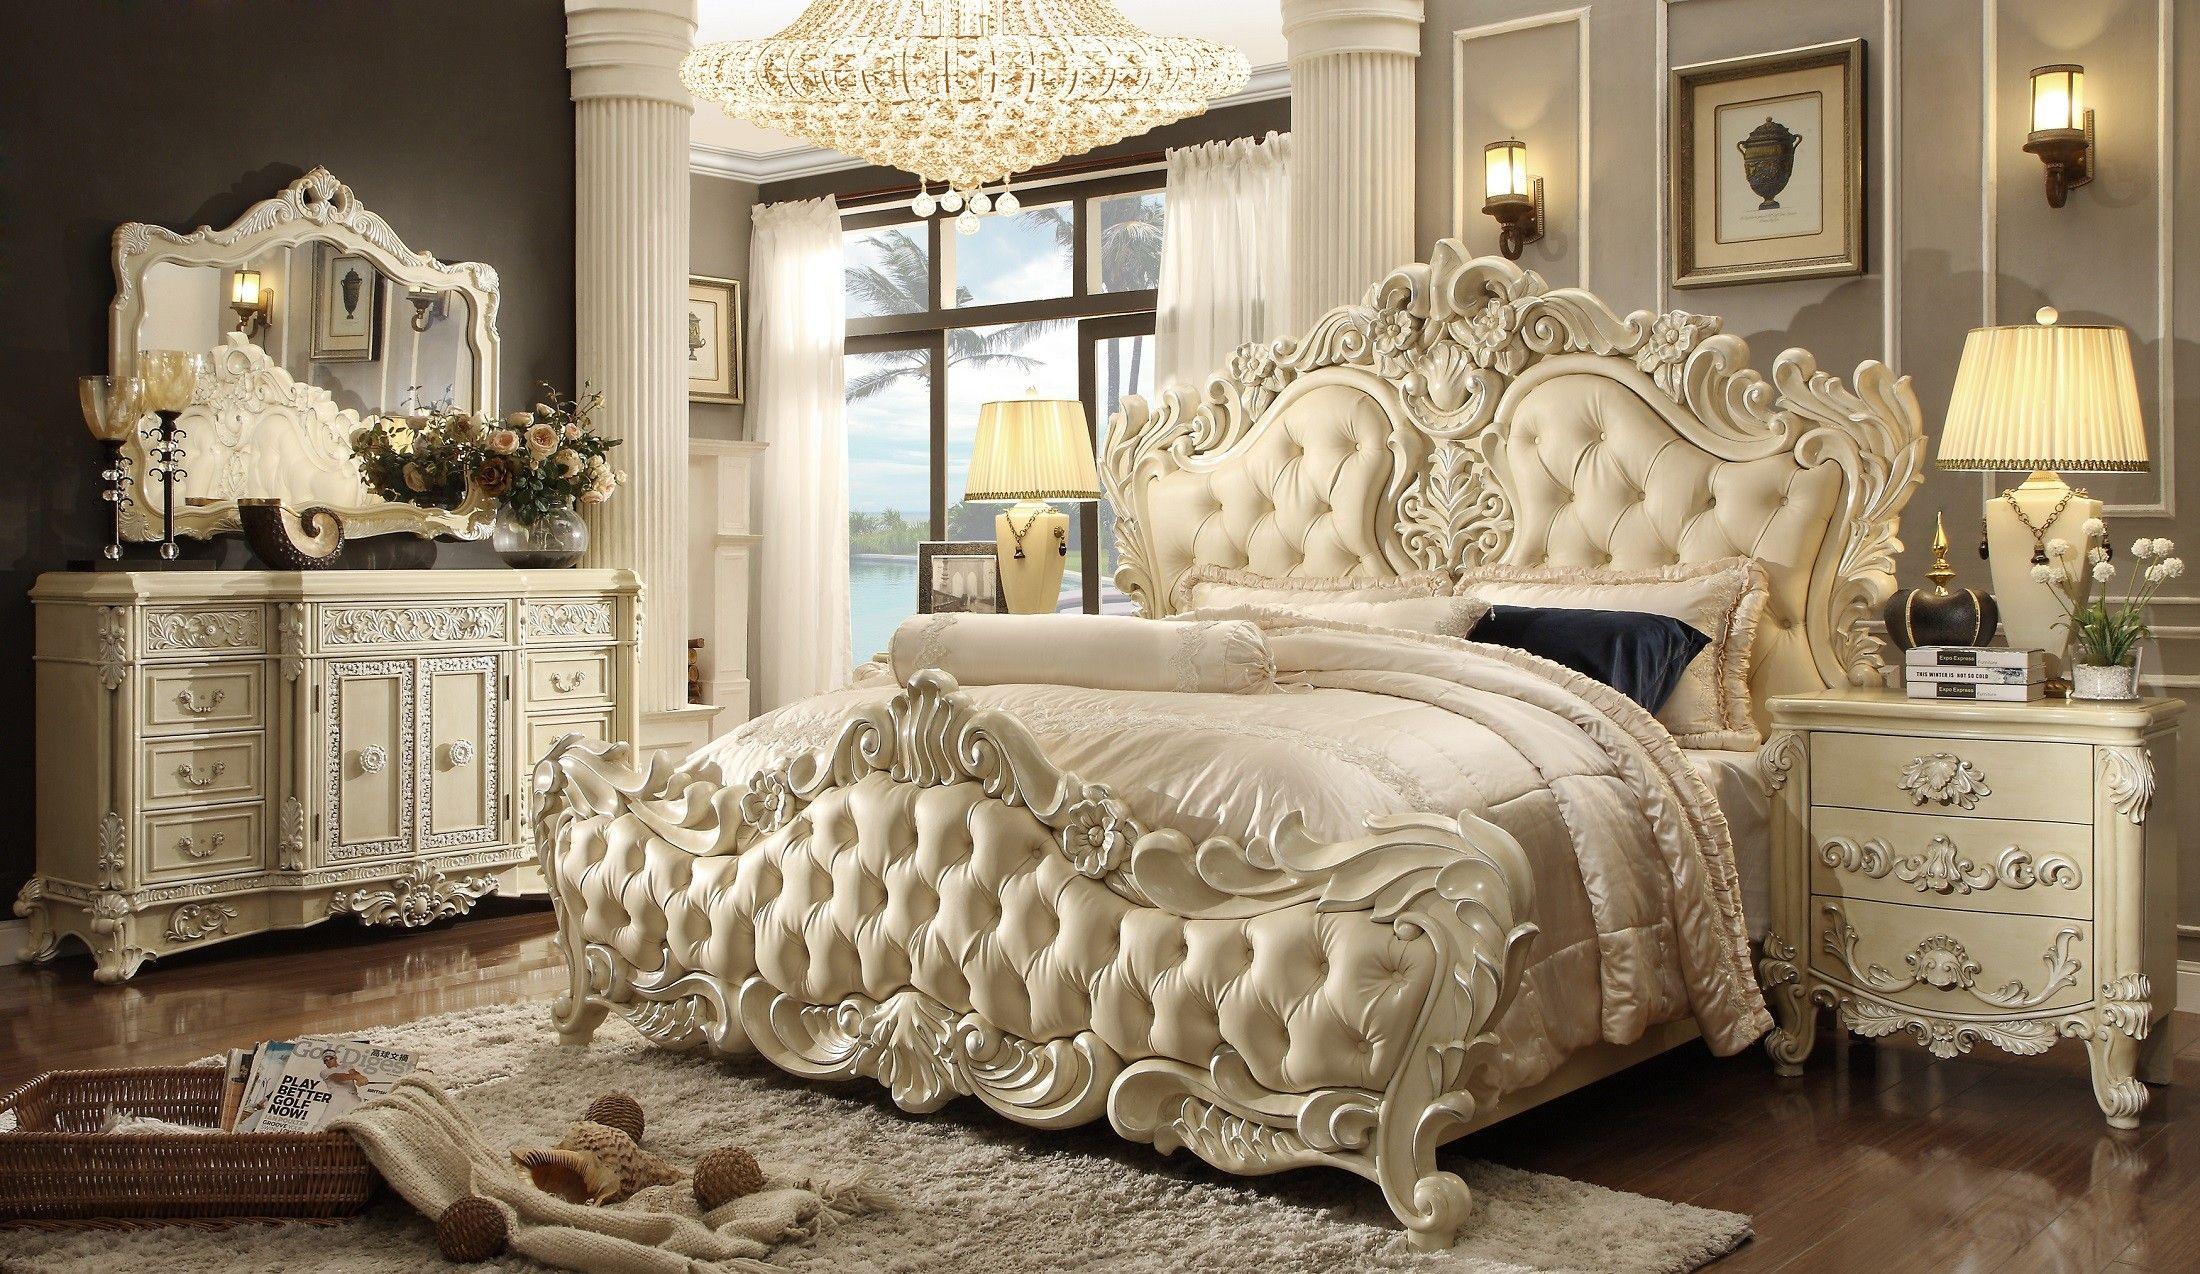 new concept 90af9 4f071 royal bedroom with antique photo frame | Bedding in 2019 ...